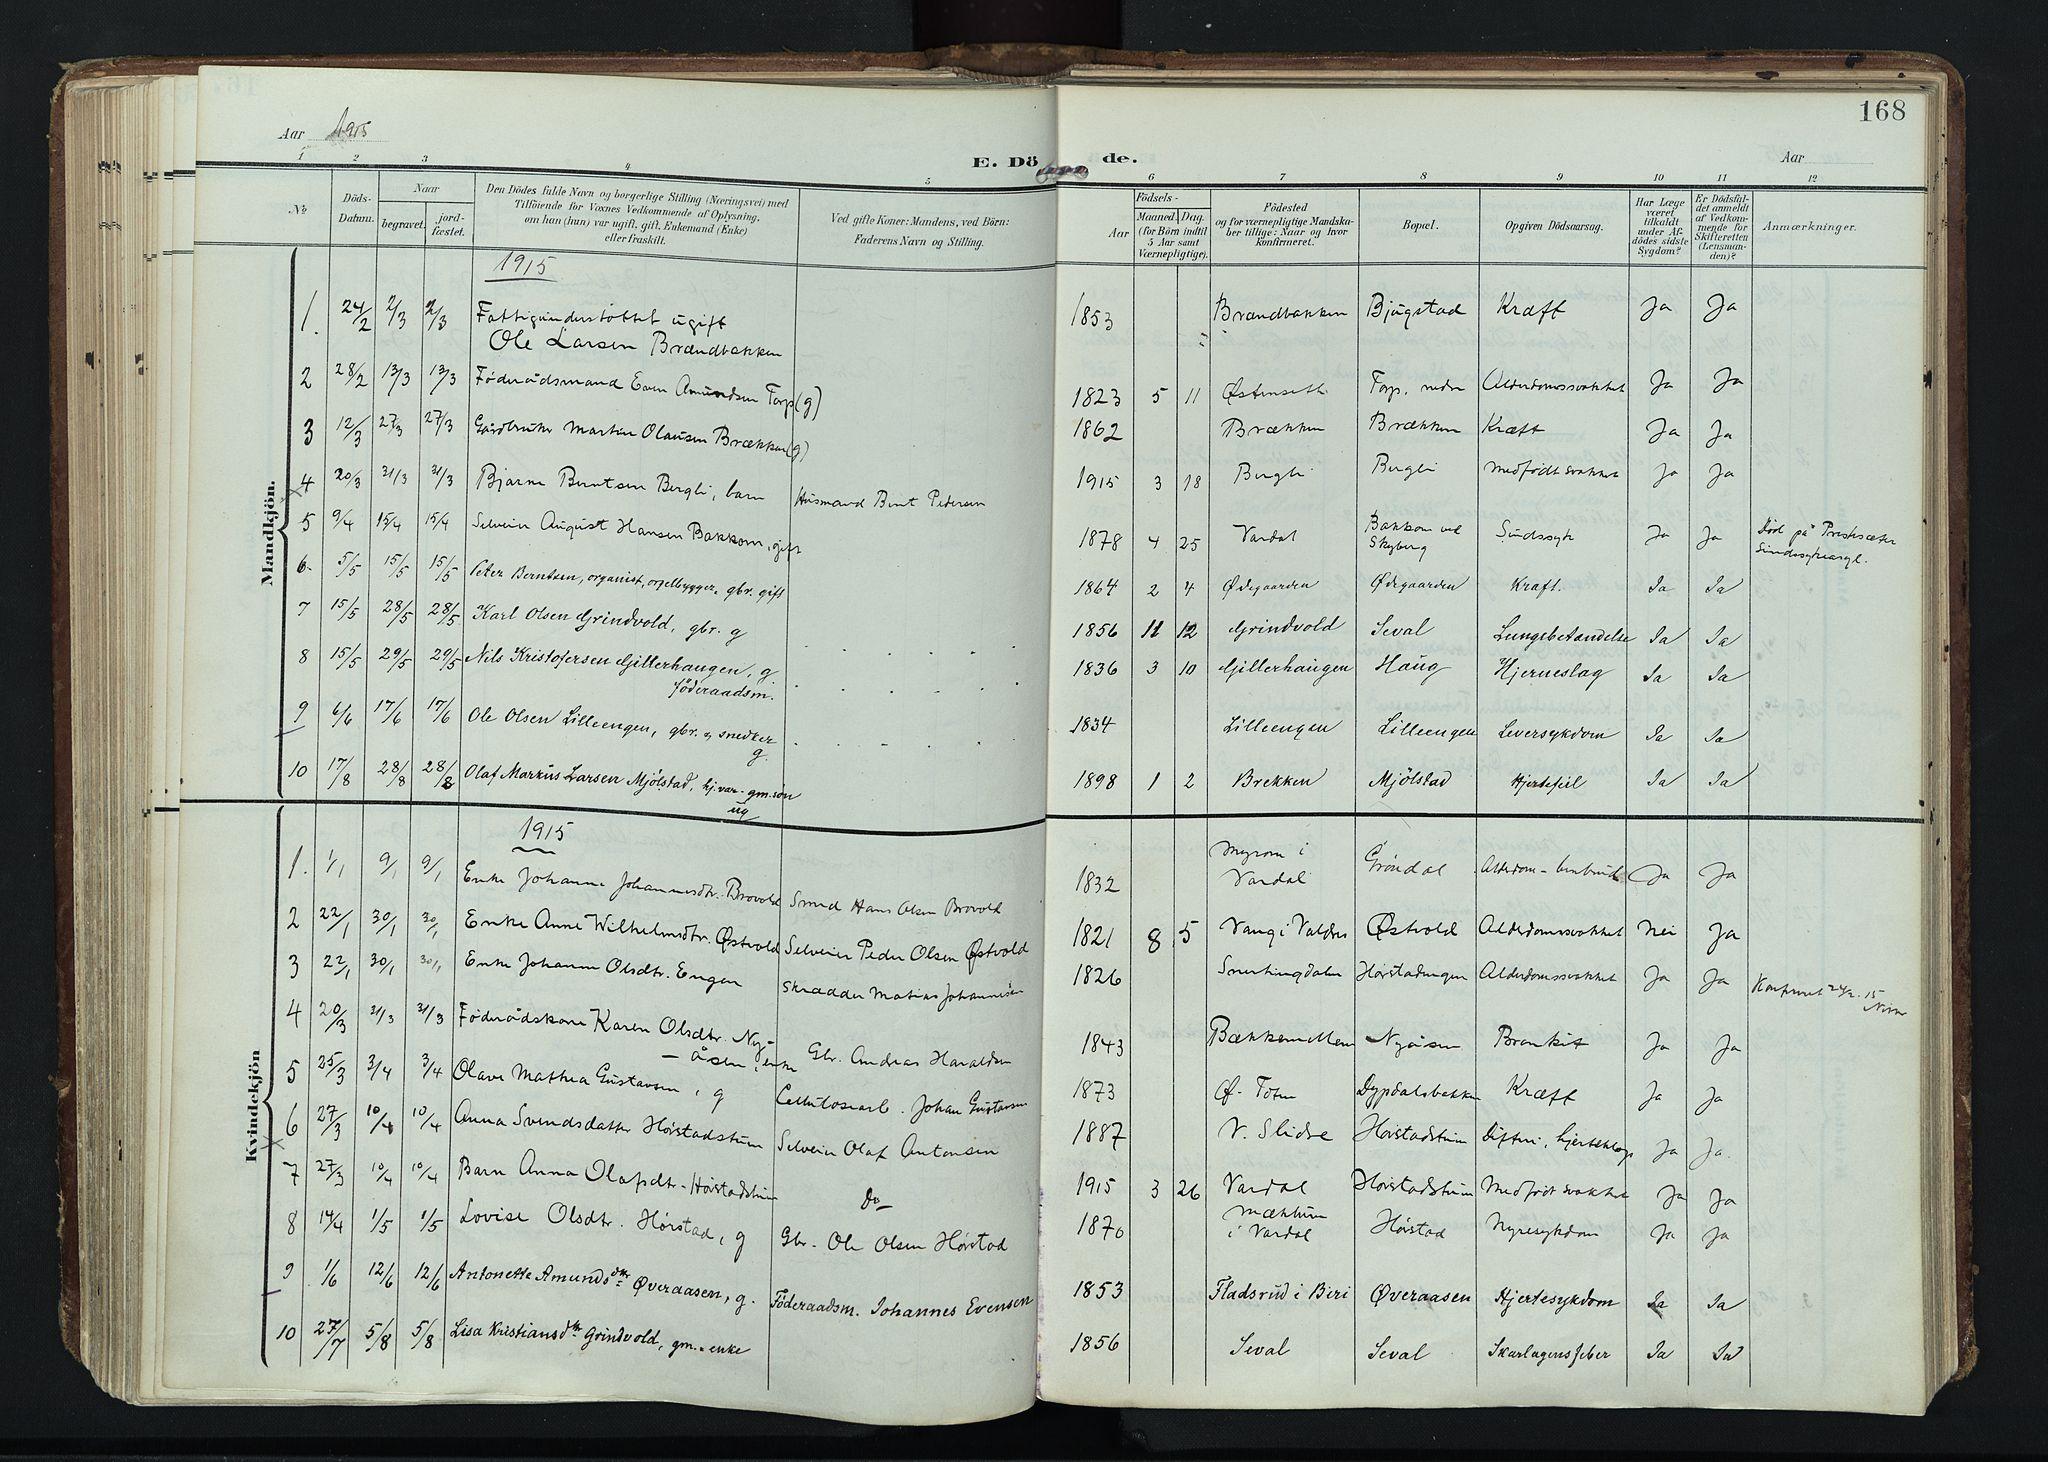 SAH, Vardal prestekontor, H/Ha/Haa/L0020: Ministerialbok nr. 20, 1907-1921, s. 168